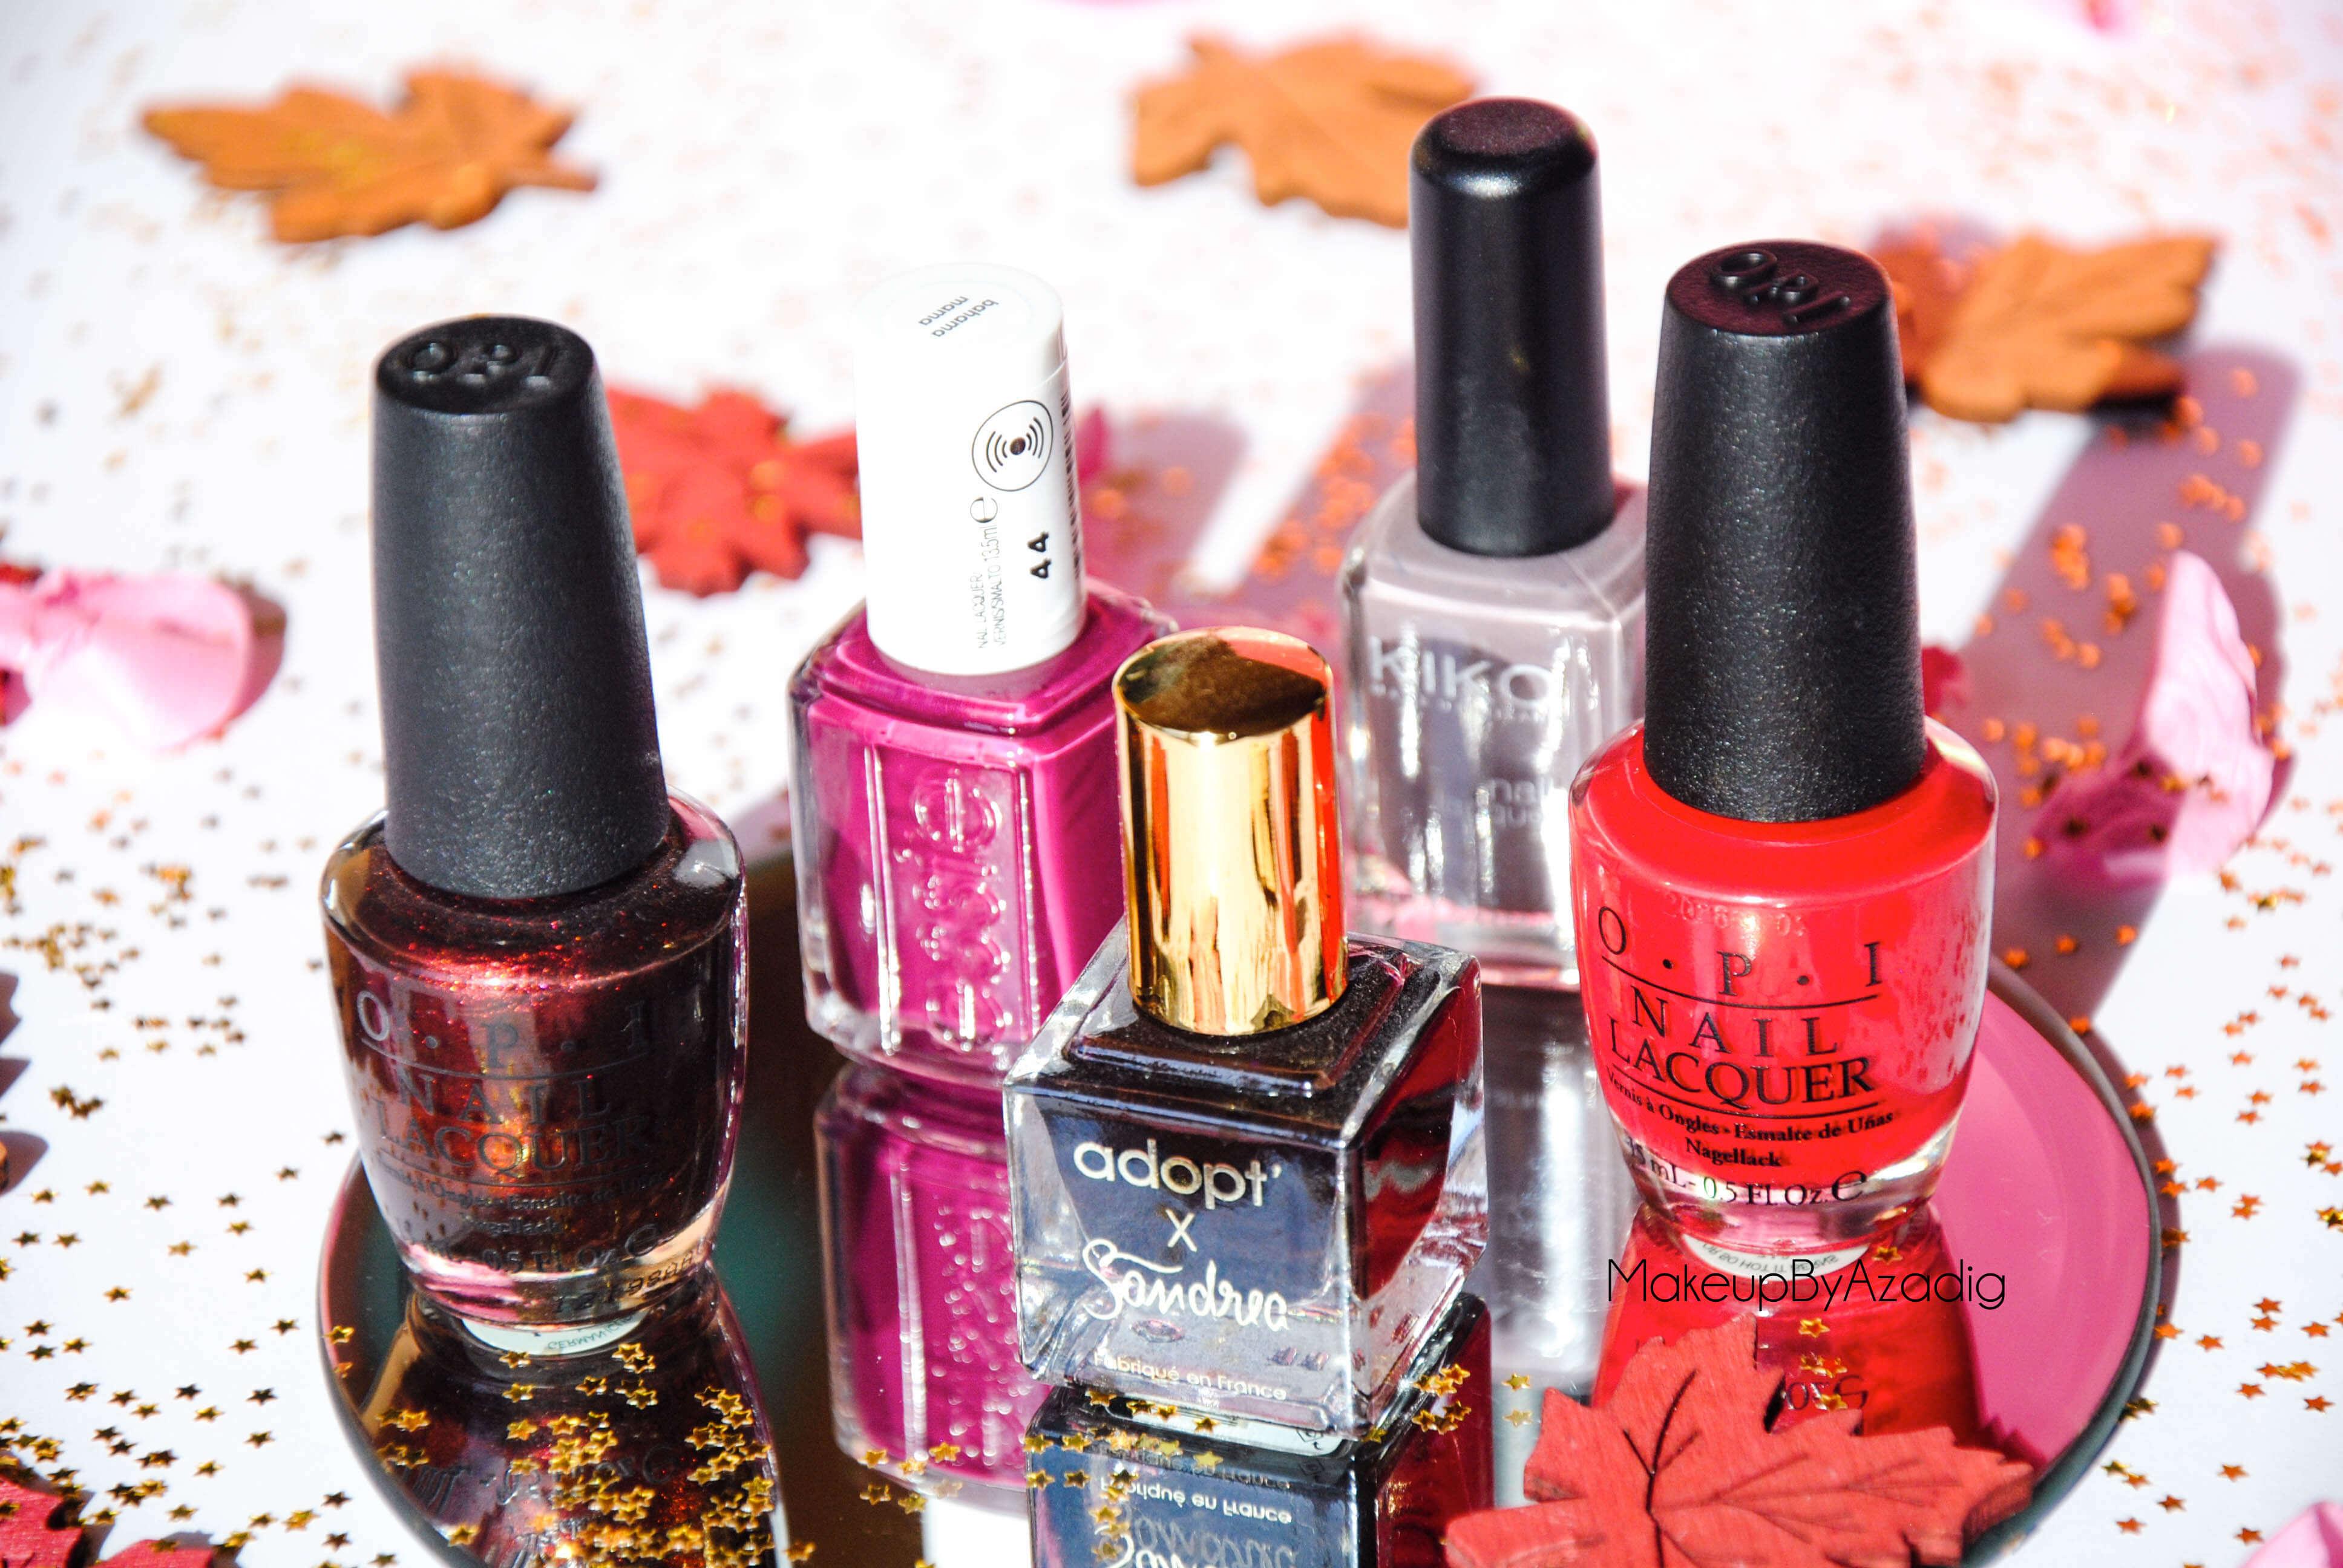 makeupbyazadig-vernis-tendance-automne-nails-autumn-formula-x-monop-makeup-troyes-dijon-paris-sandrea26france-camaieu-opi-kiko-sephora-mavala-essie-art